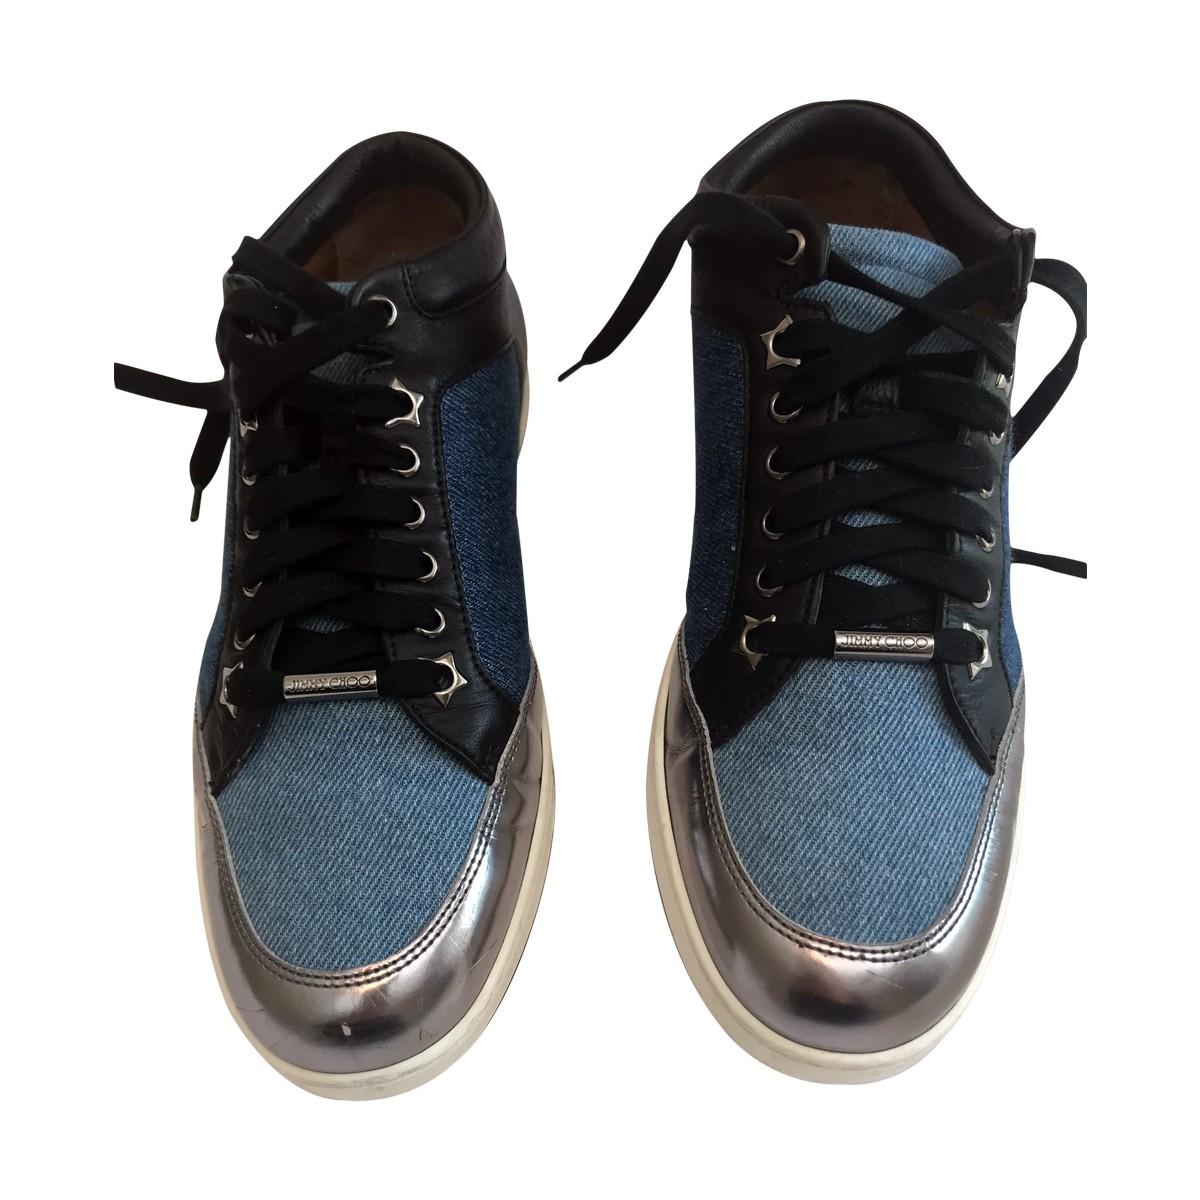 Jimmy Choo Jeans sneakers | My good closet